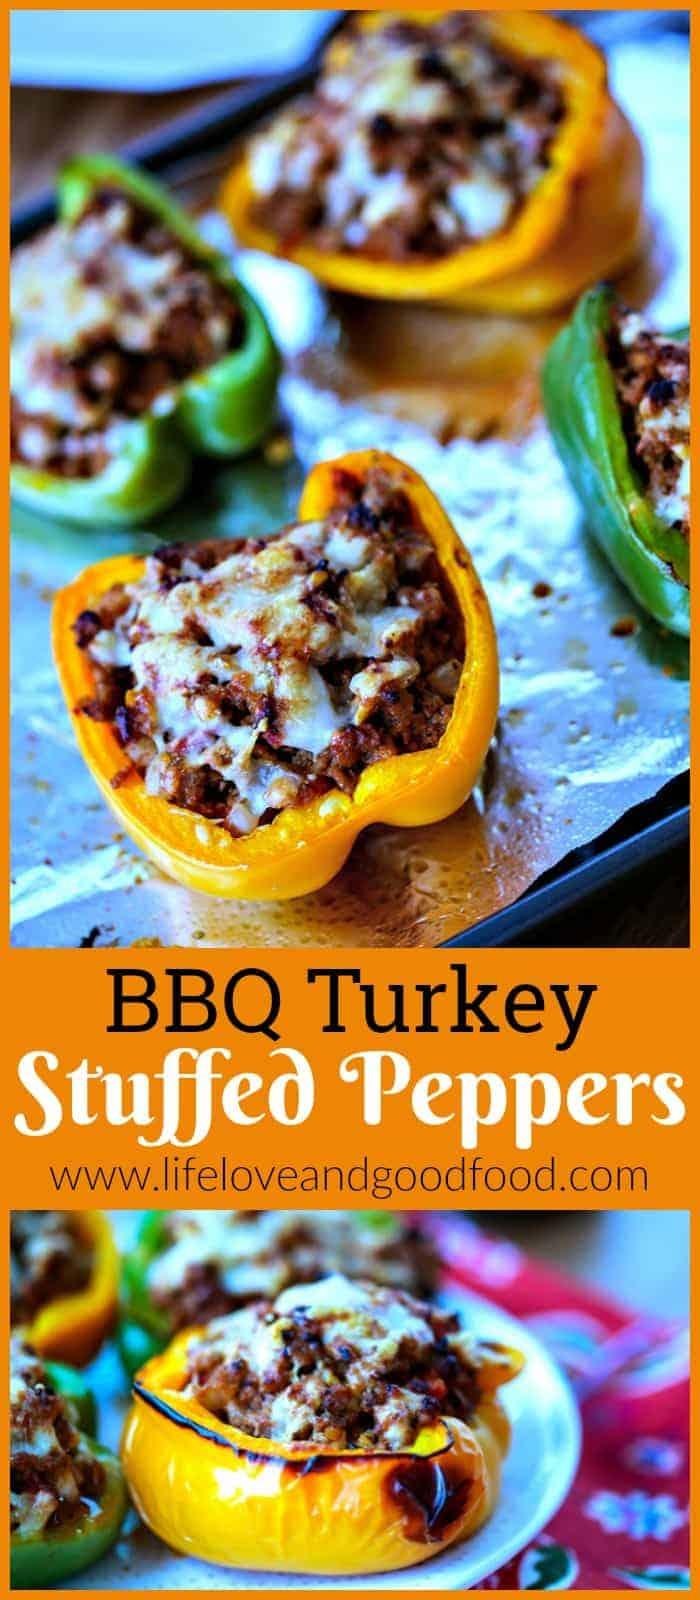 BBQ Turkey Stuffed Peppers | Life, Love, and Good Food